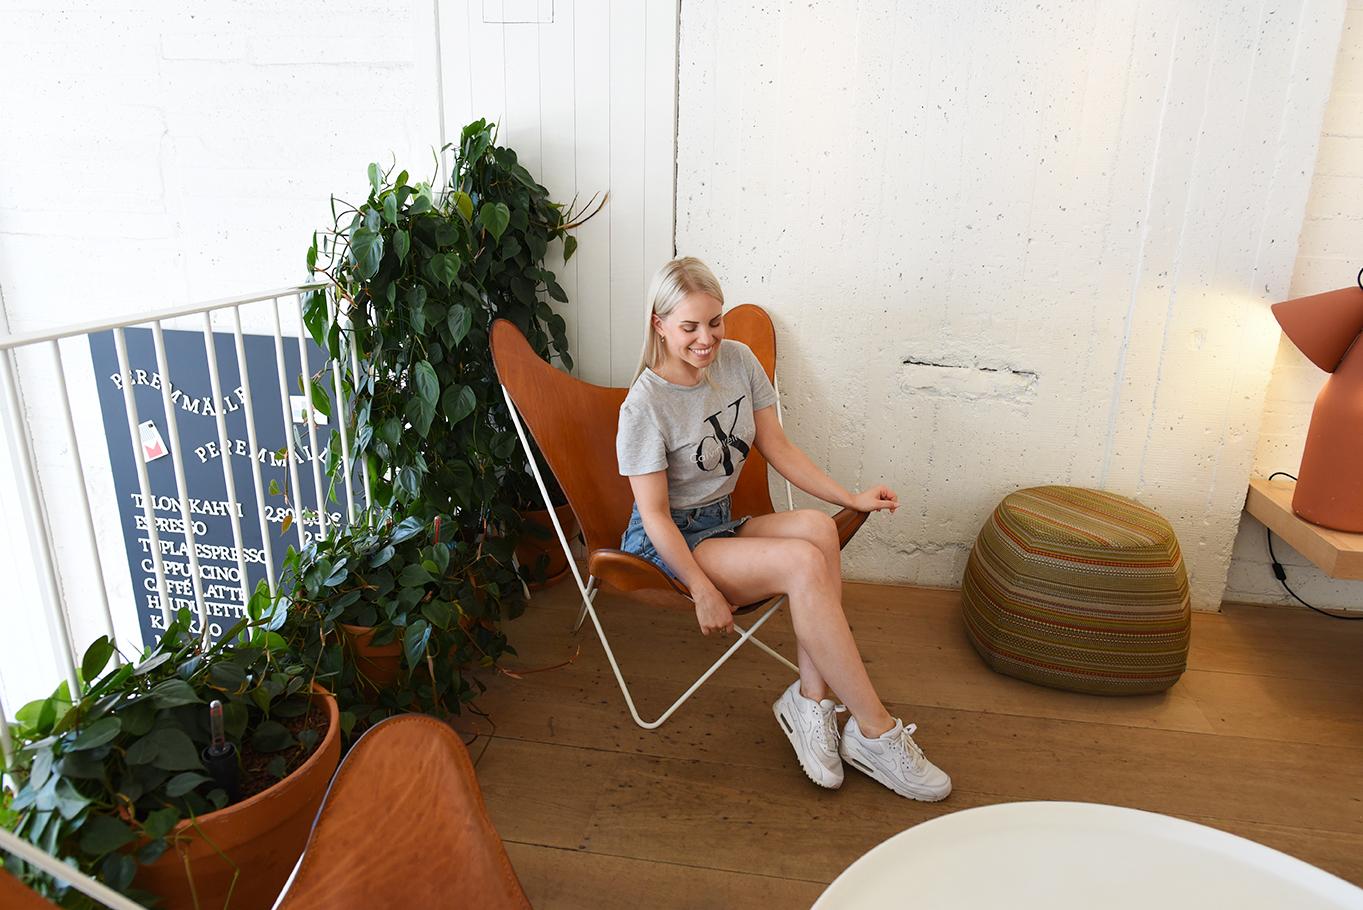 ipikulmakuppila-kallio-kahvila-sundayblondie-4.jpg